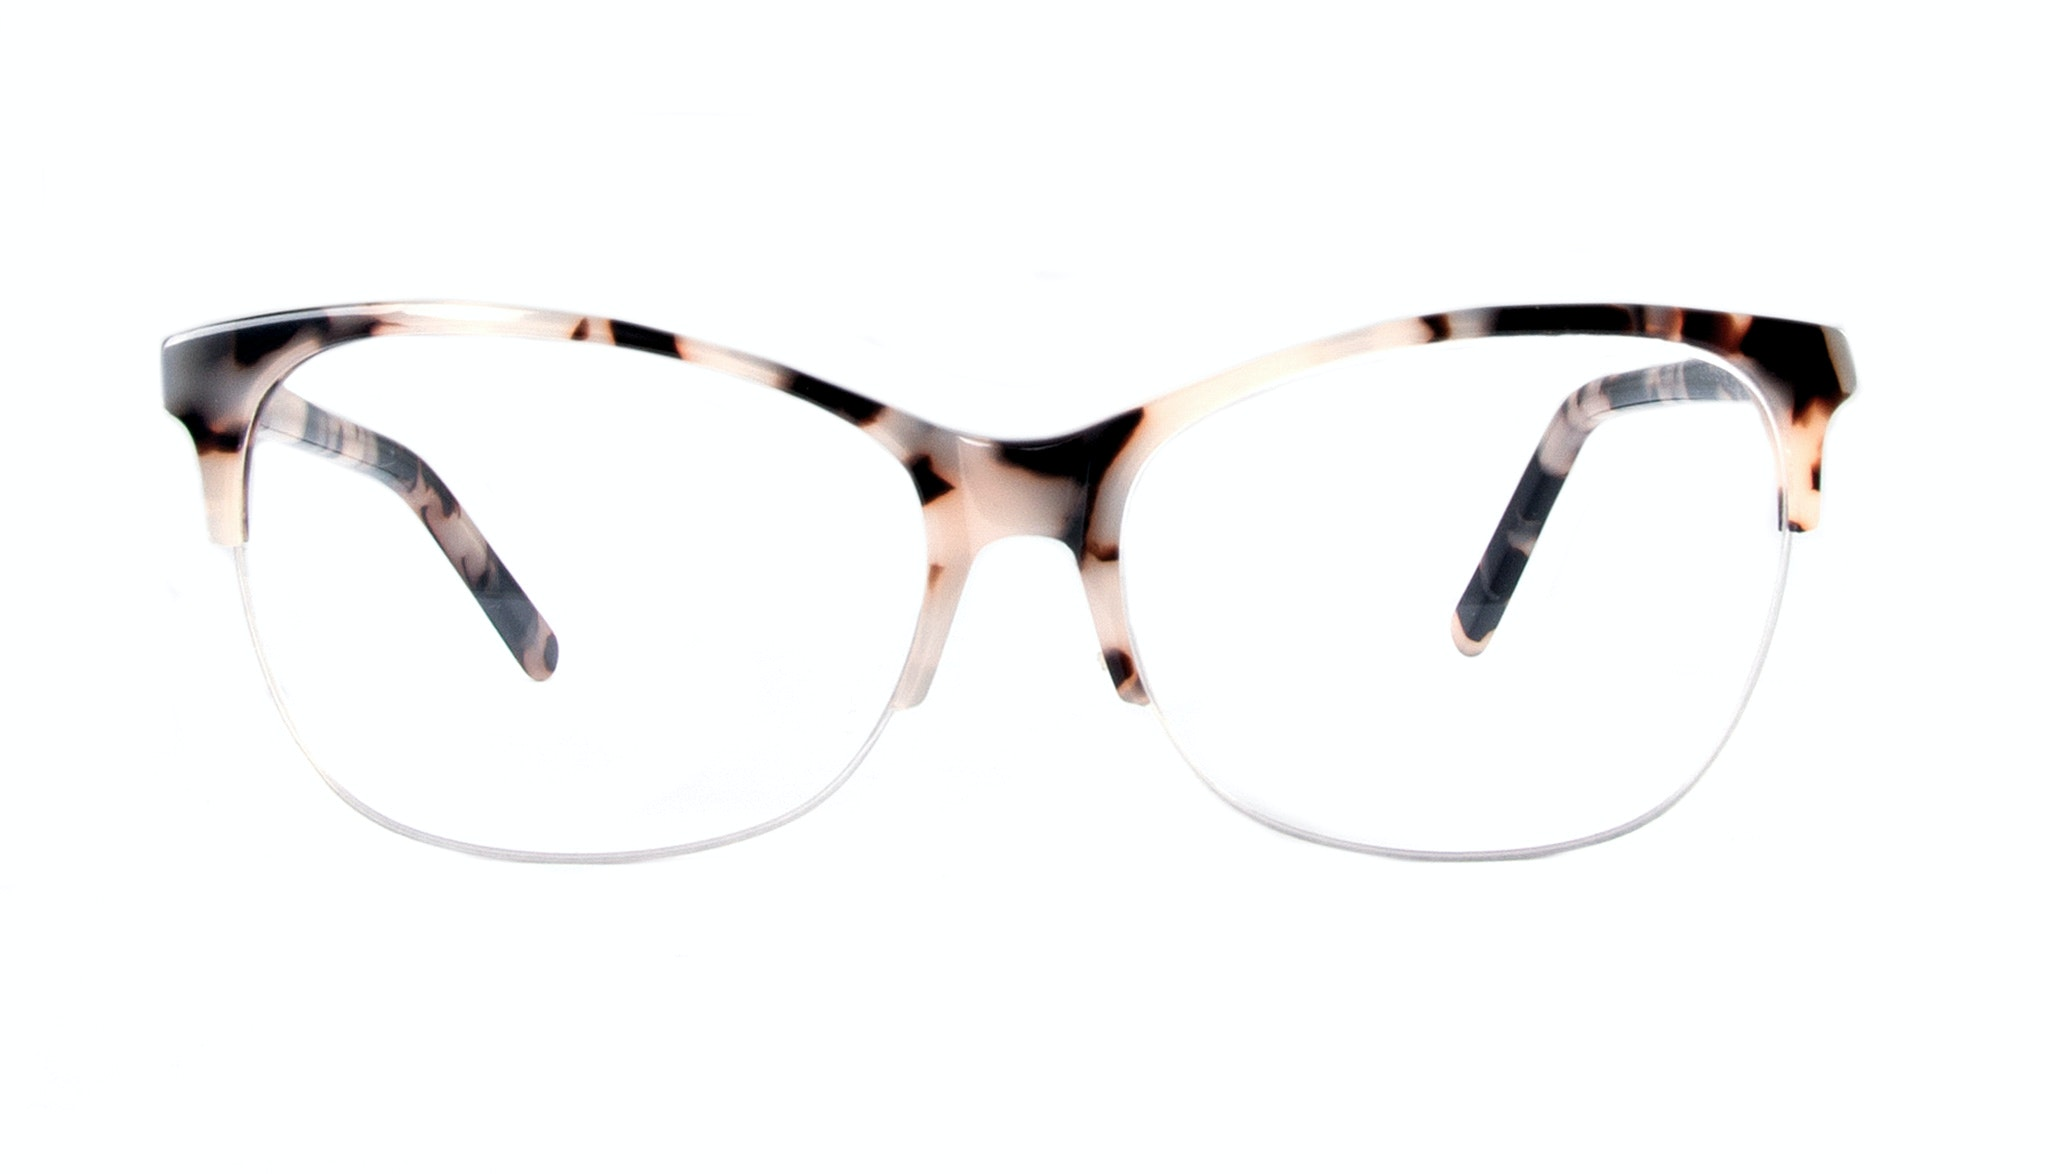 Affordable Fashion Glasses Cat Eye Rectangle Semi-Rimless Eyeglasses Women Flair Light Granite Front